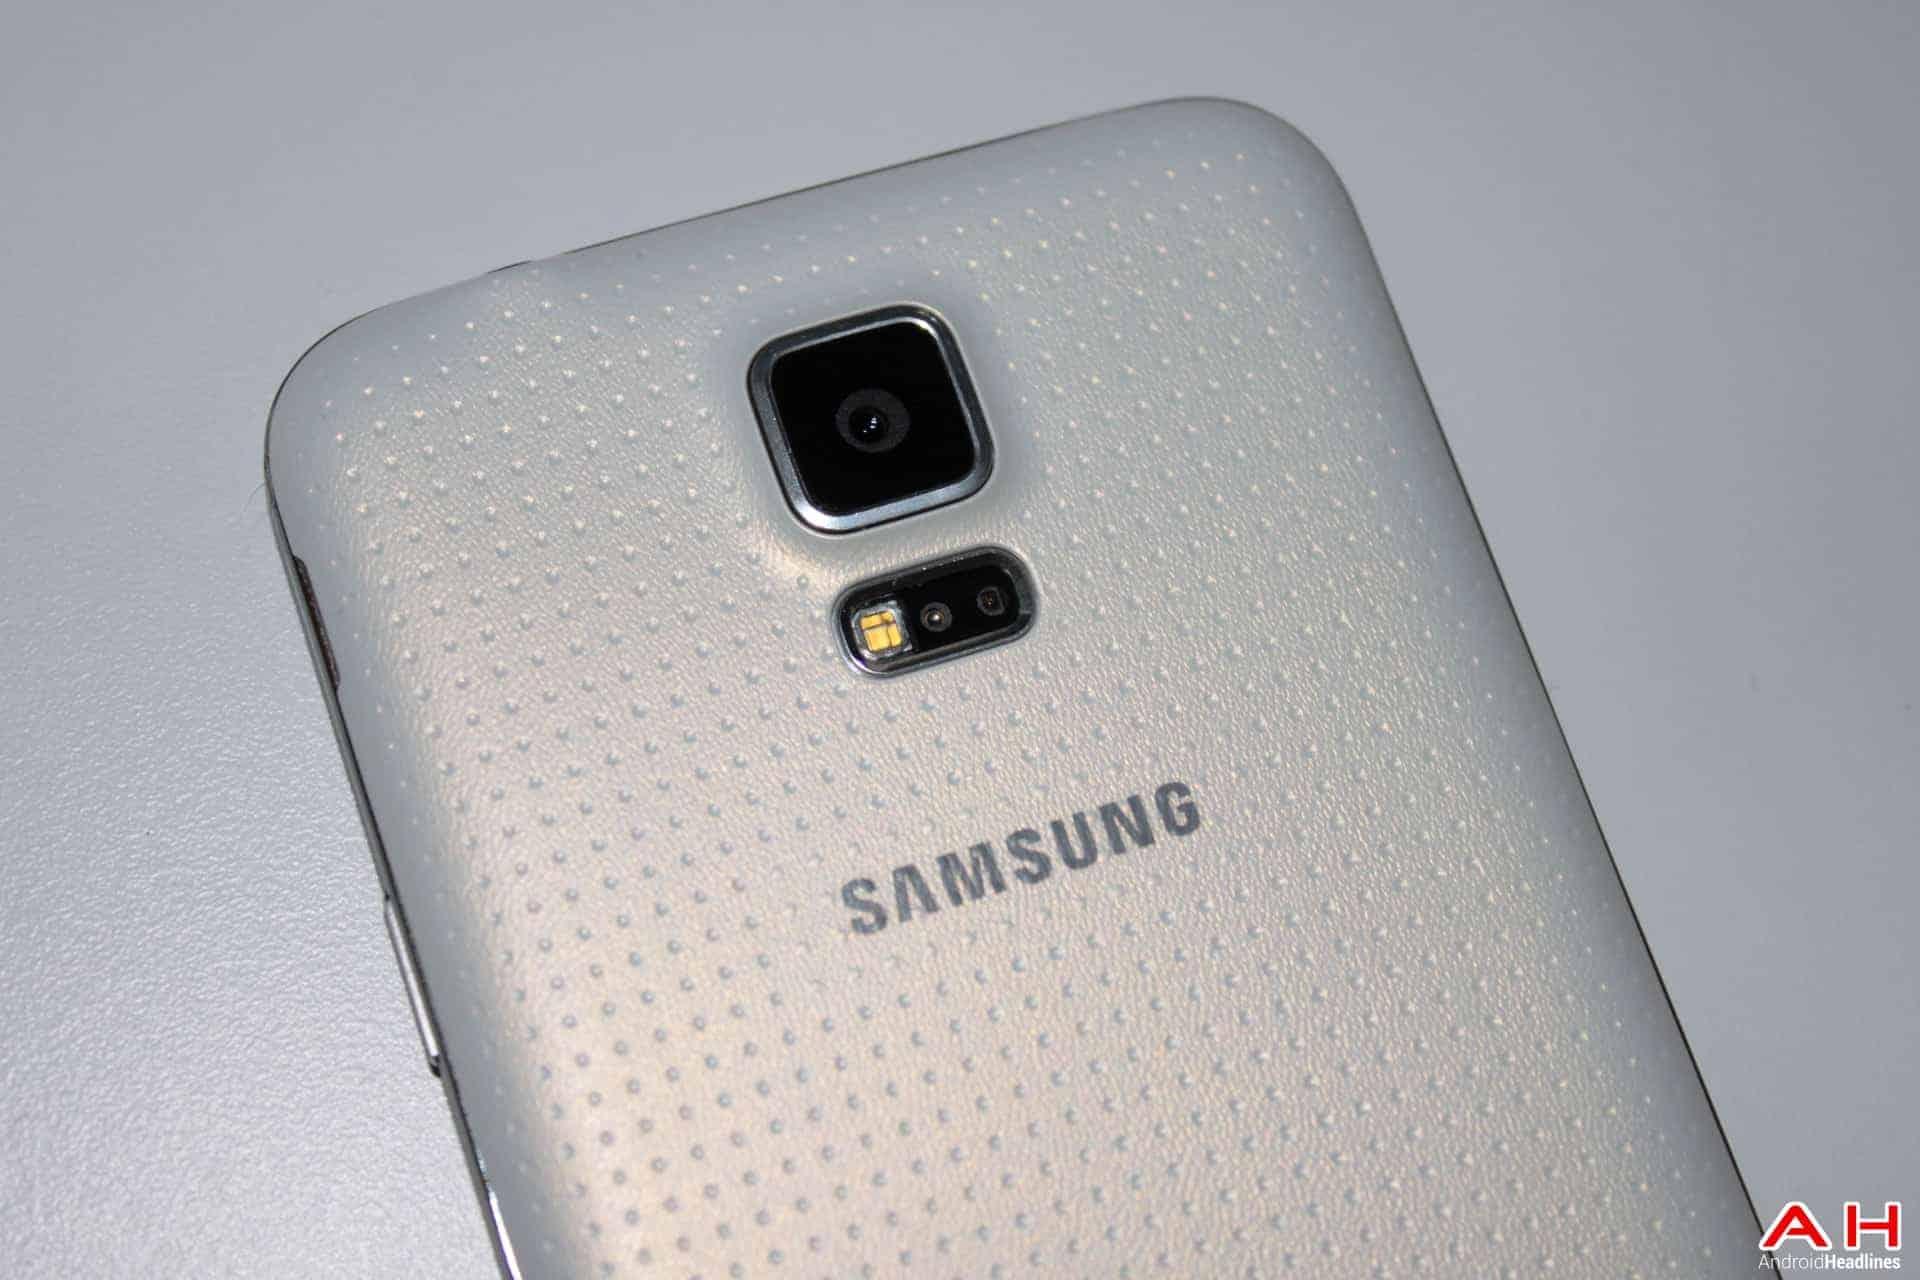 AH Samsung Galaxy S5 -13 LOGO